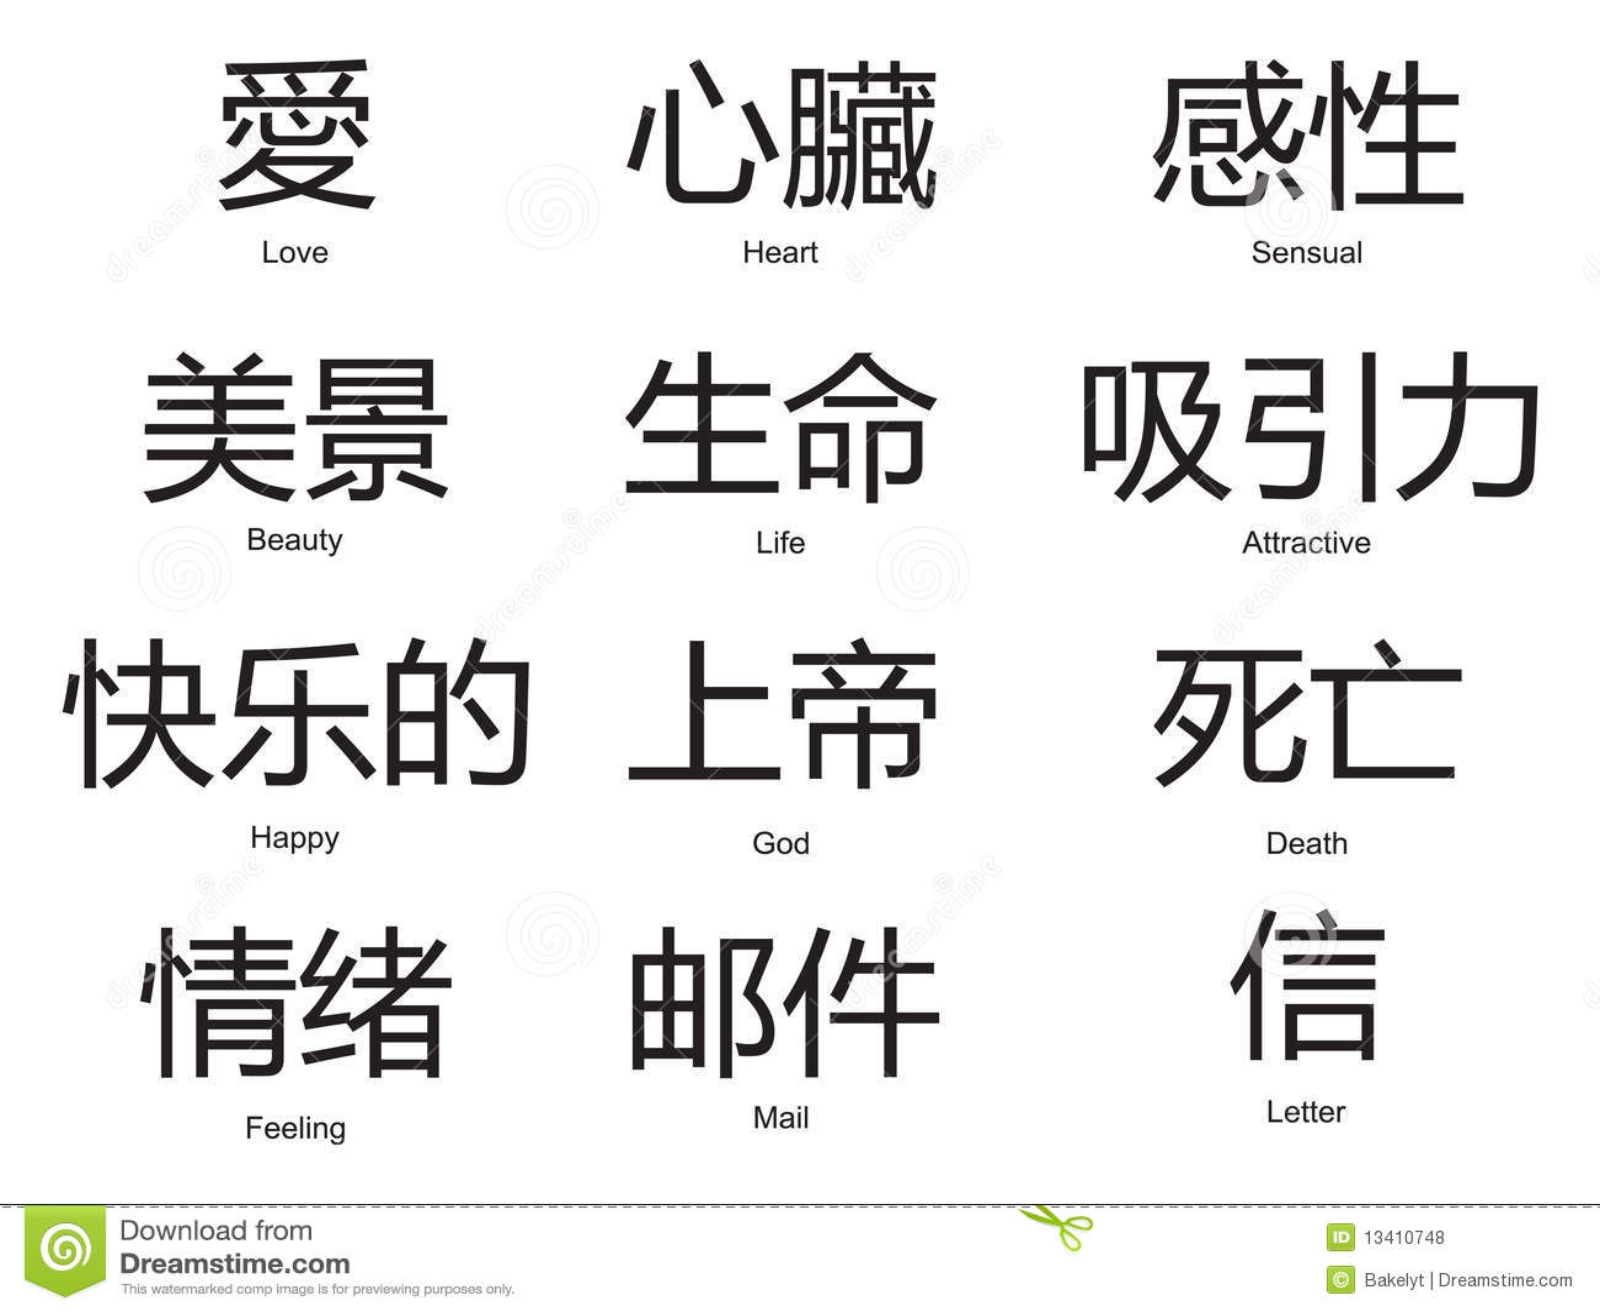 chinese writing and translation